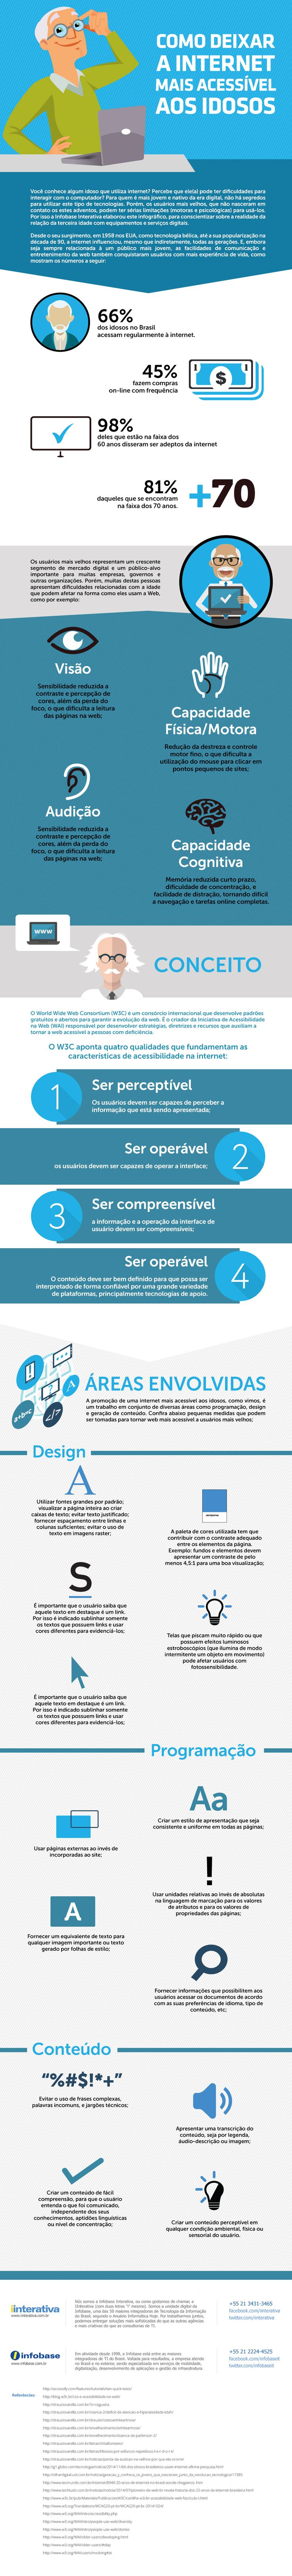 Internet para idosos #infografico